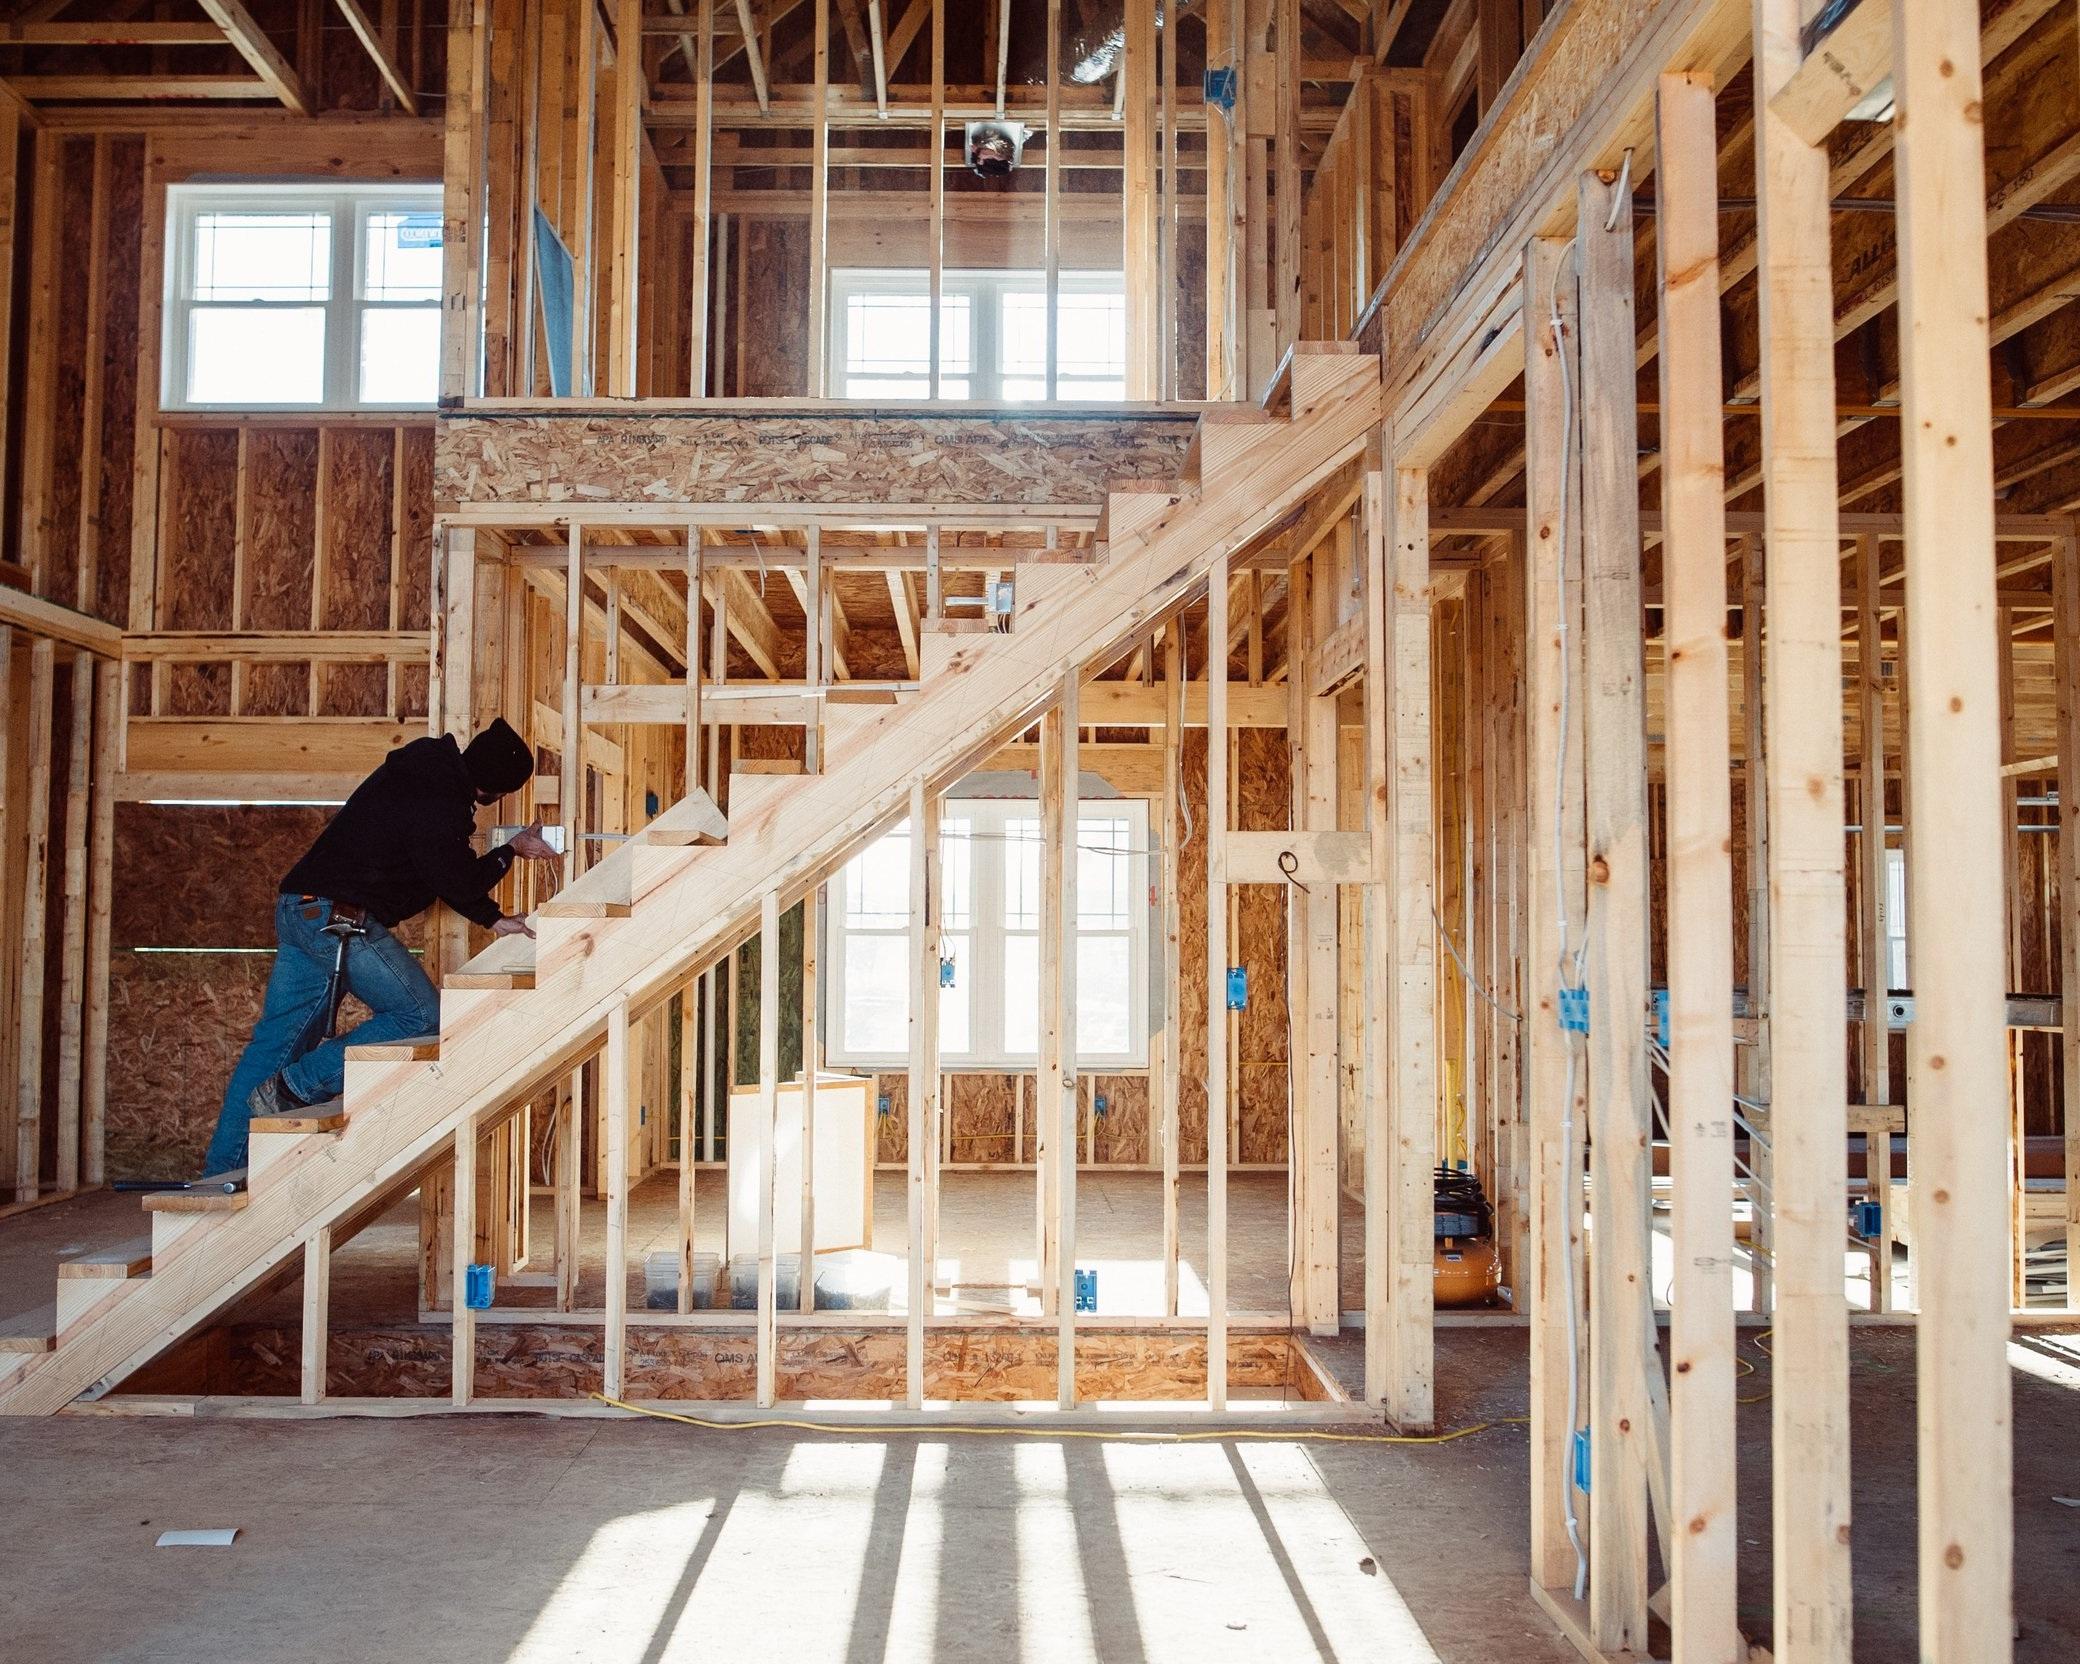 construction-daylight-estate-1687410.jpg